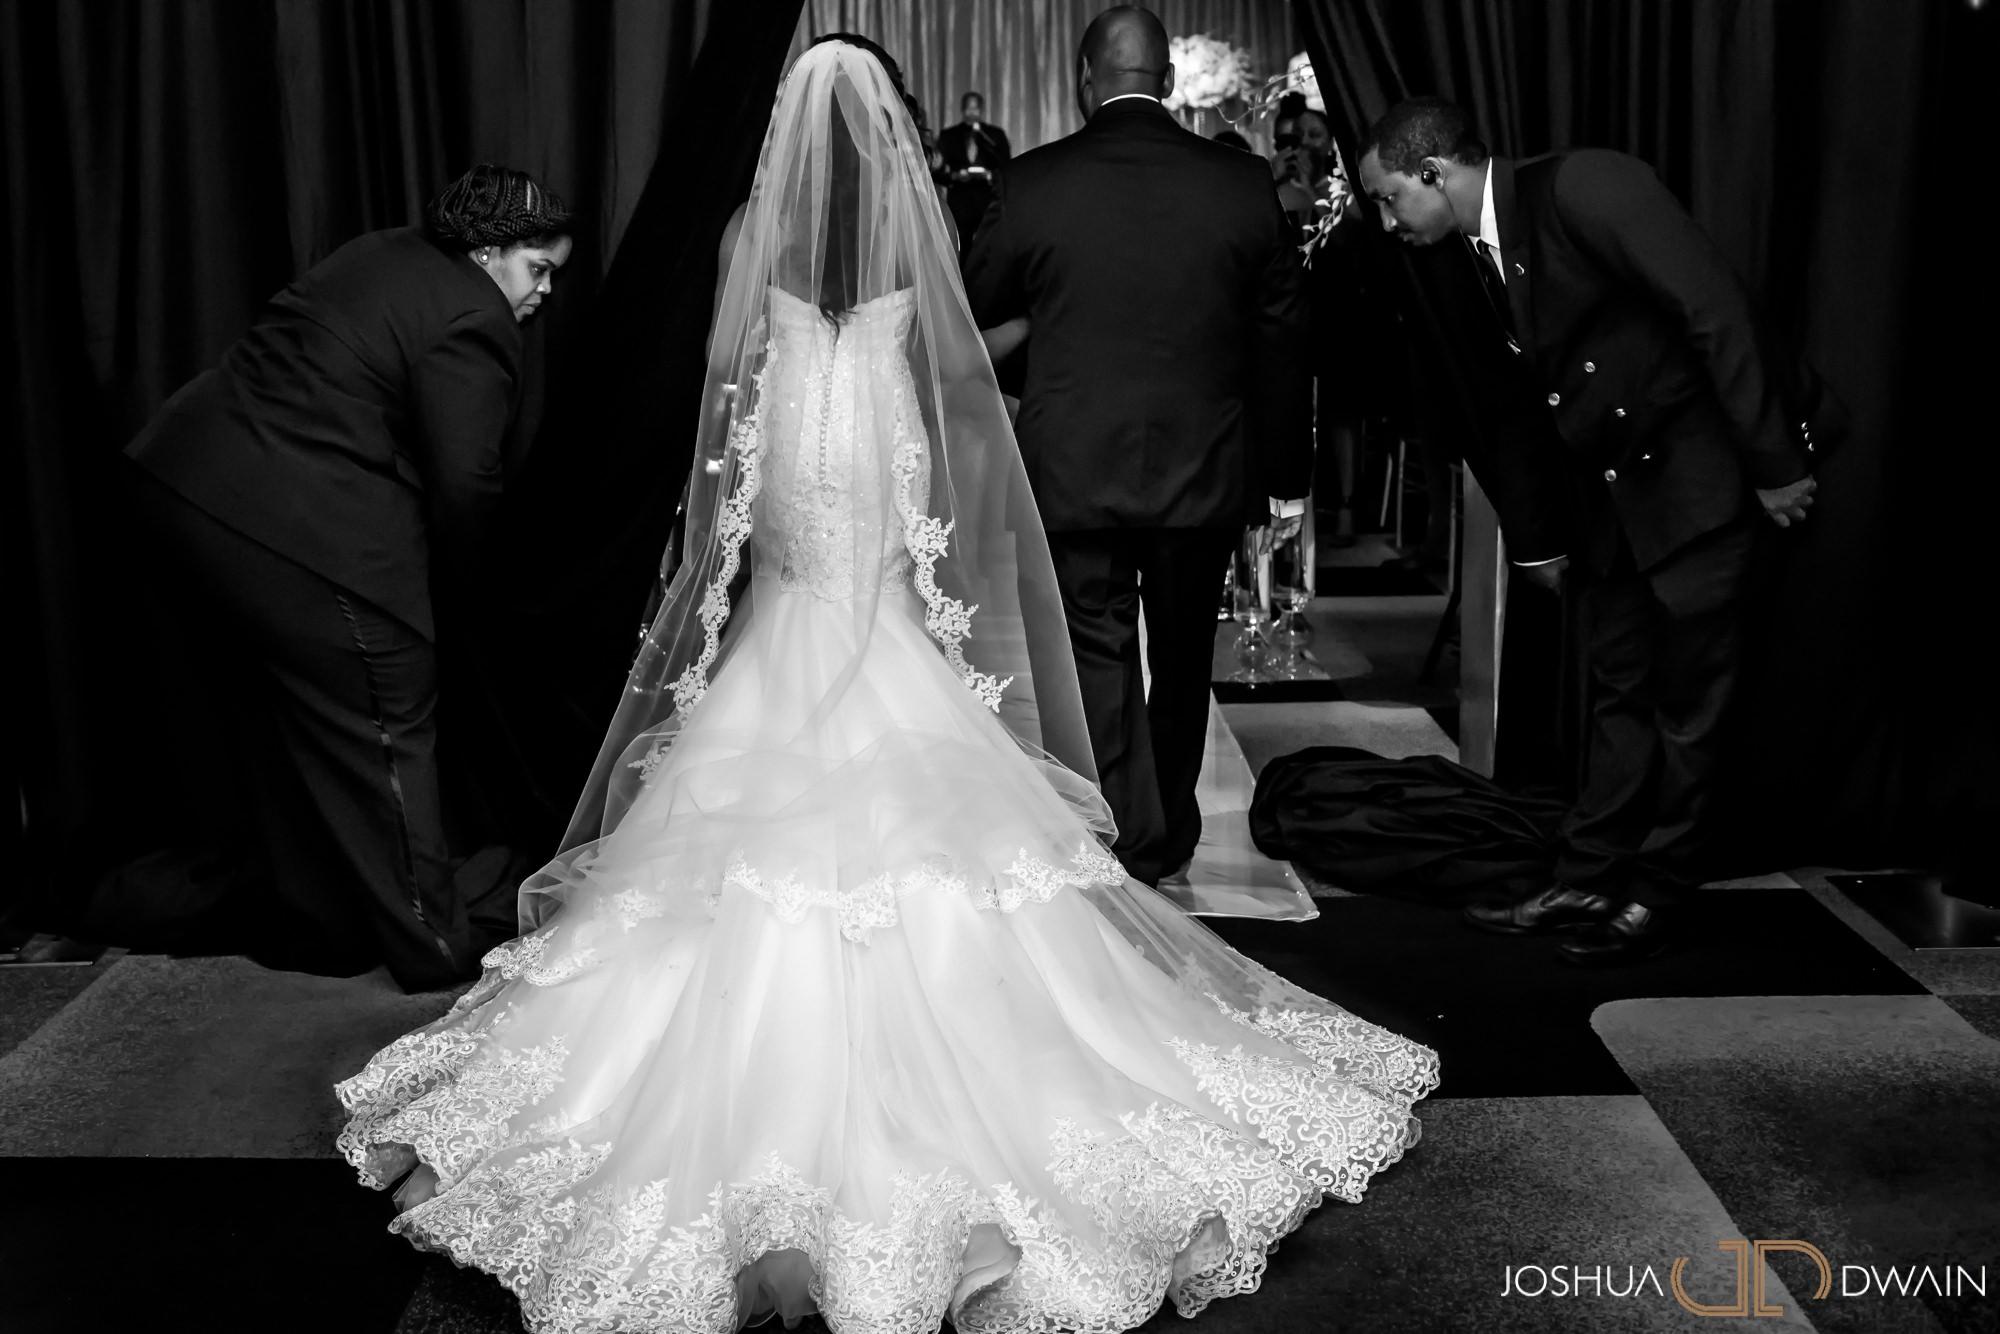 shameka-jeremy-019-watergate-hotel-washington-dc-wedding-joshua-dwain-photography